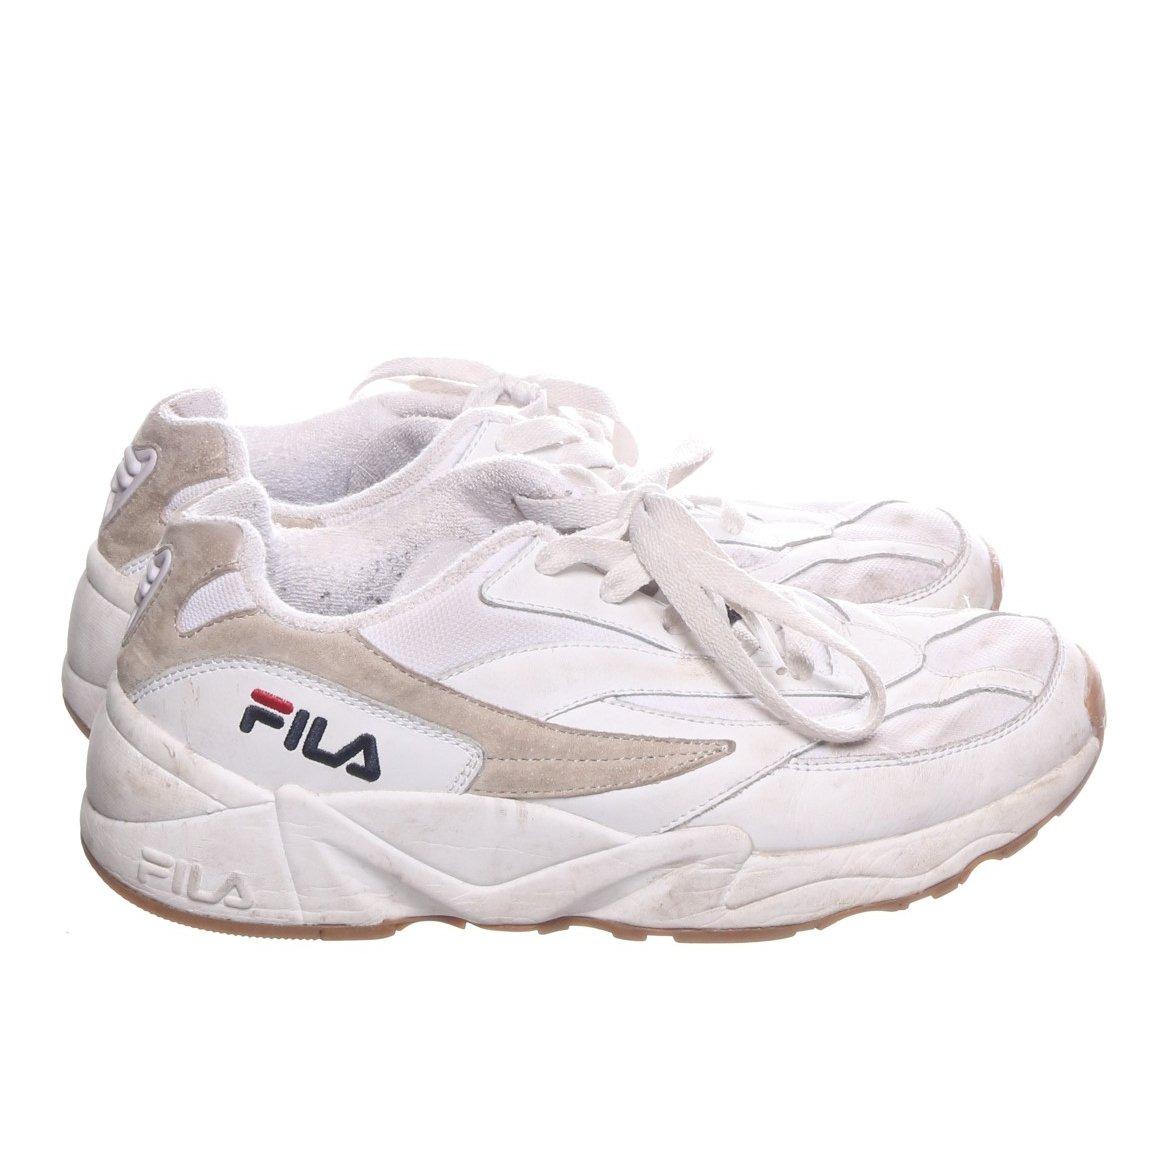 Fila, Sneakers, Strl: 42, Venom Low, Vit, Skinn